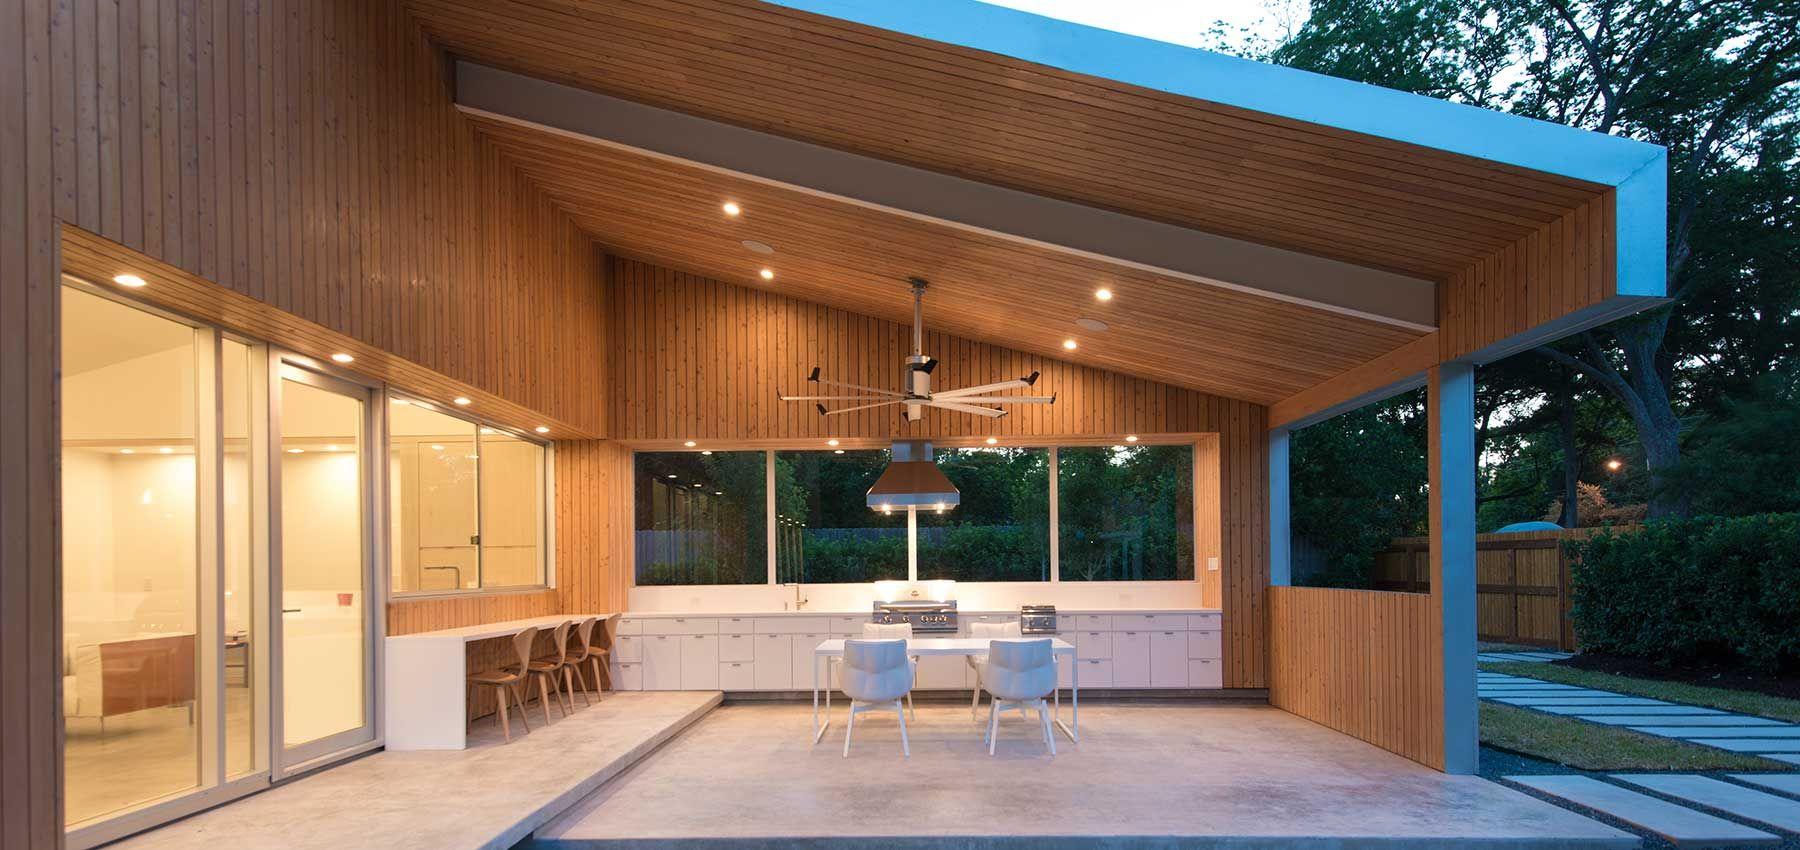 nested House patio